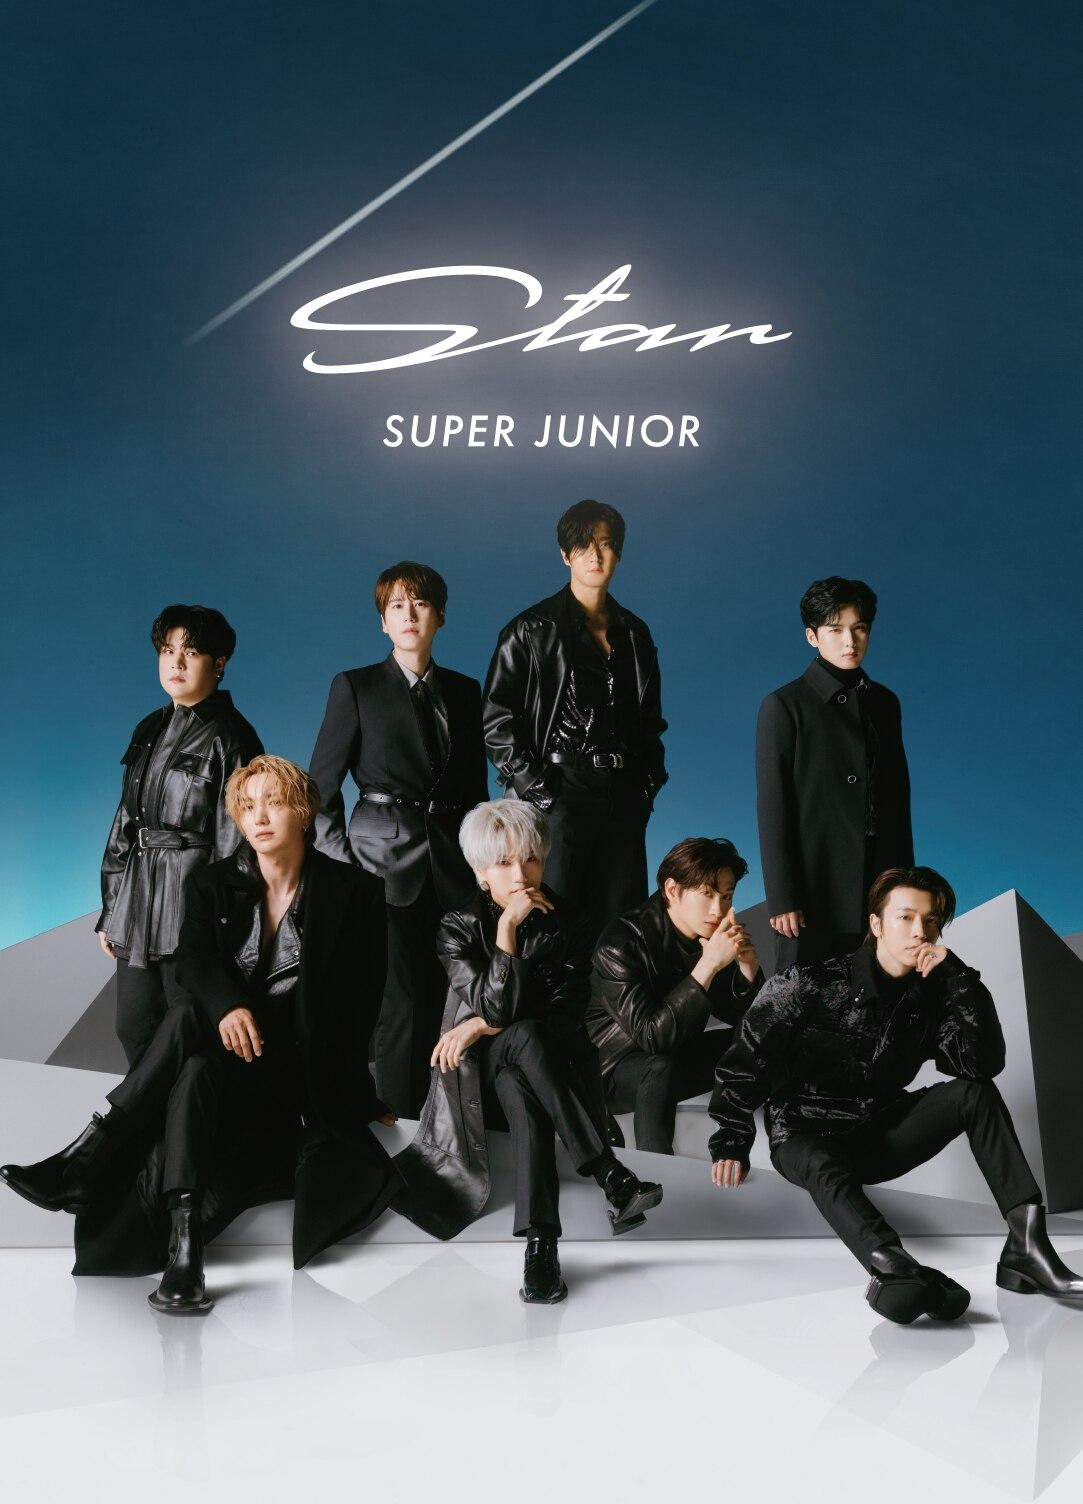 Super Junior – Star [MP3 320 / WEB] [2021.01.27]